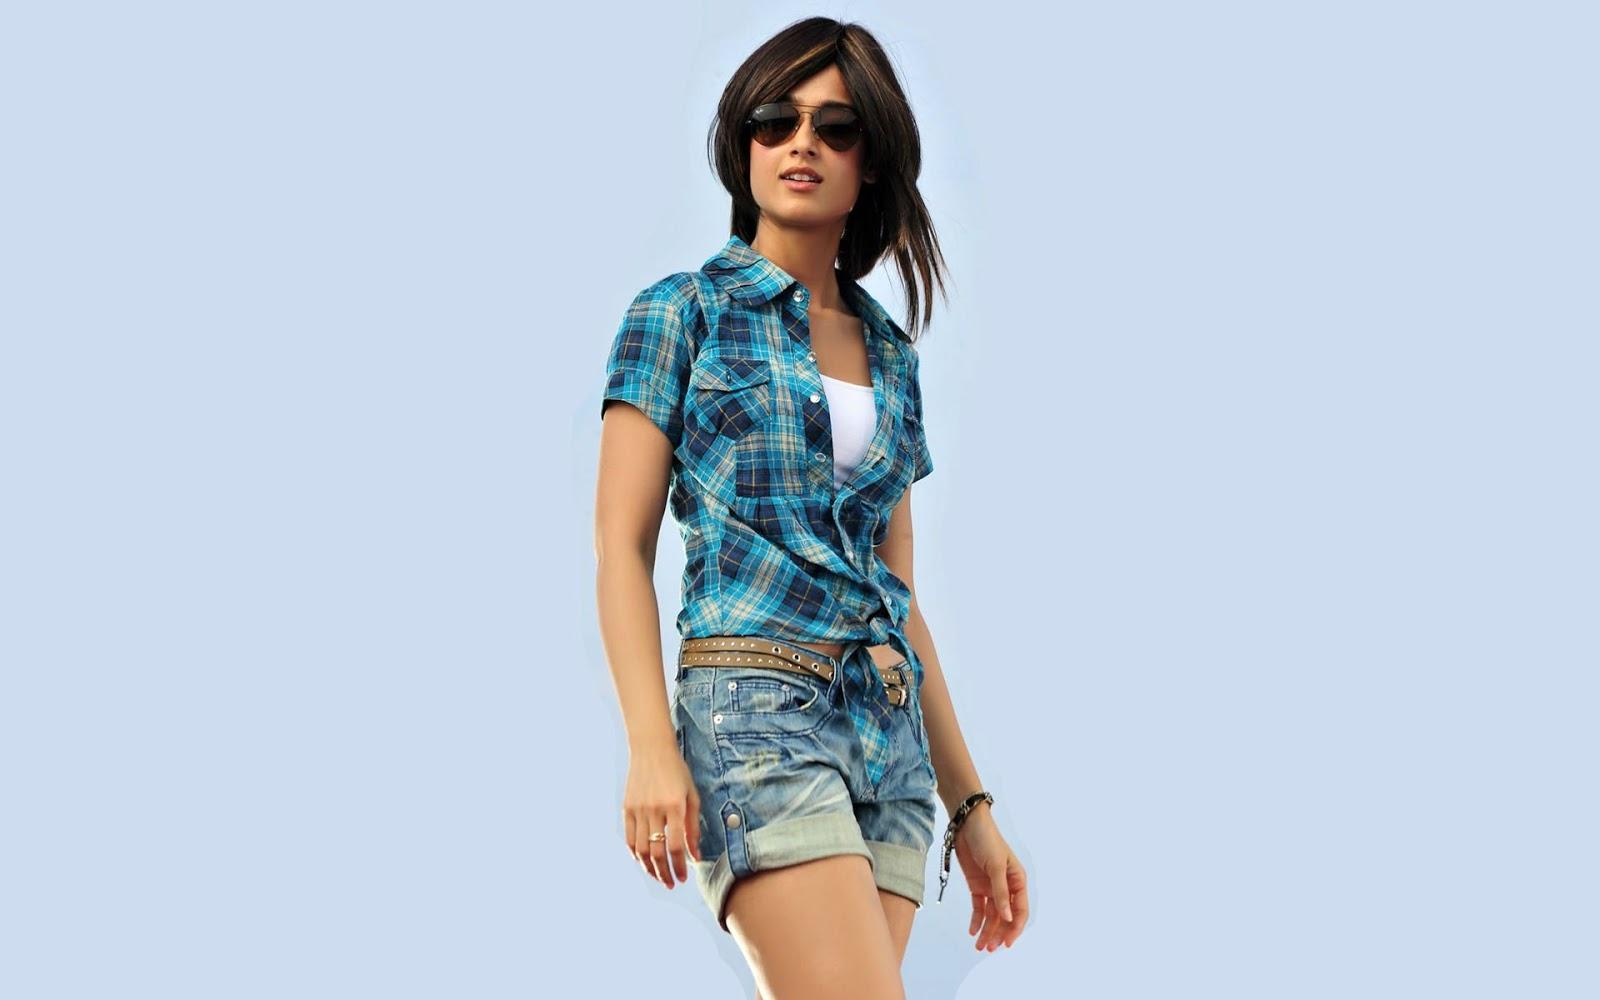 Ileana D'Cruz Short Jeans Wallpaper